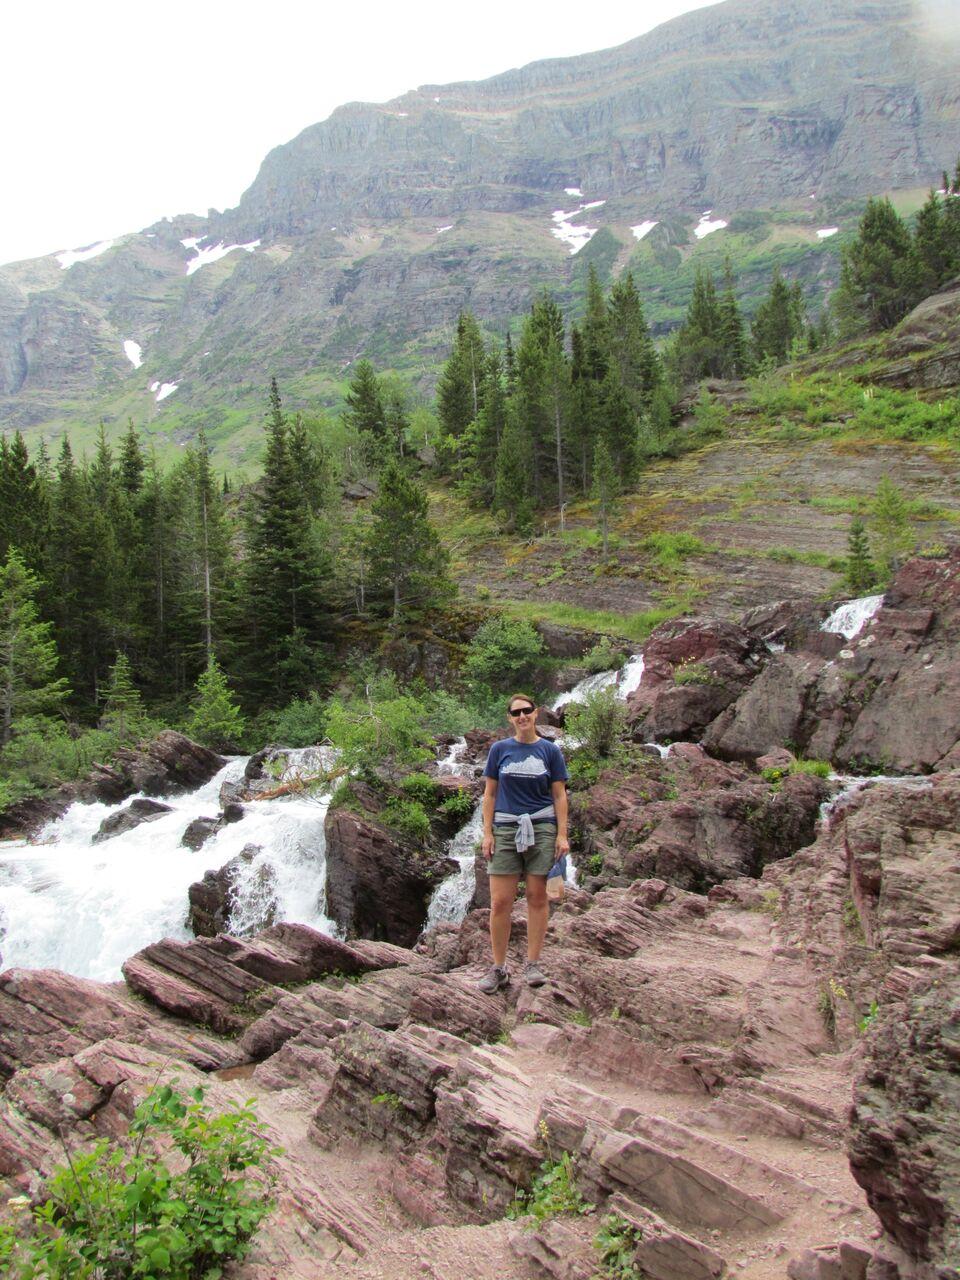 HikingGlacier_preview.jpeg